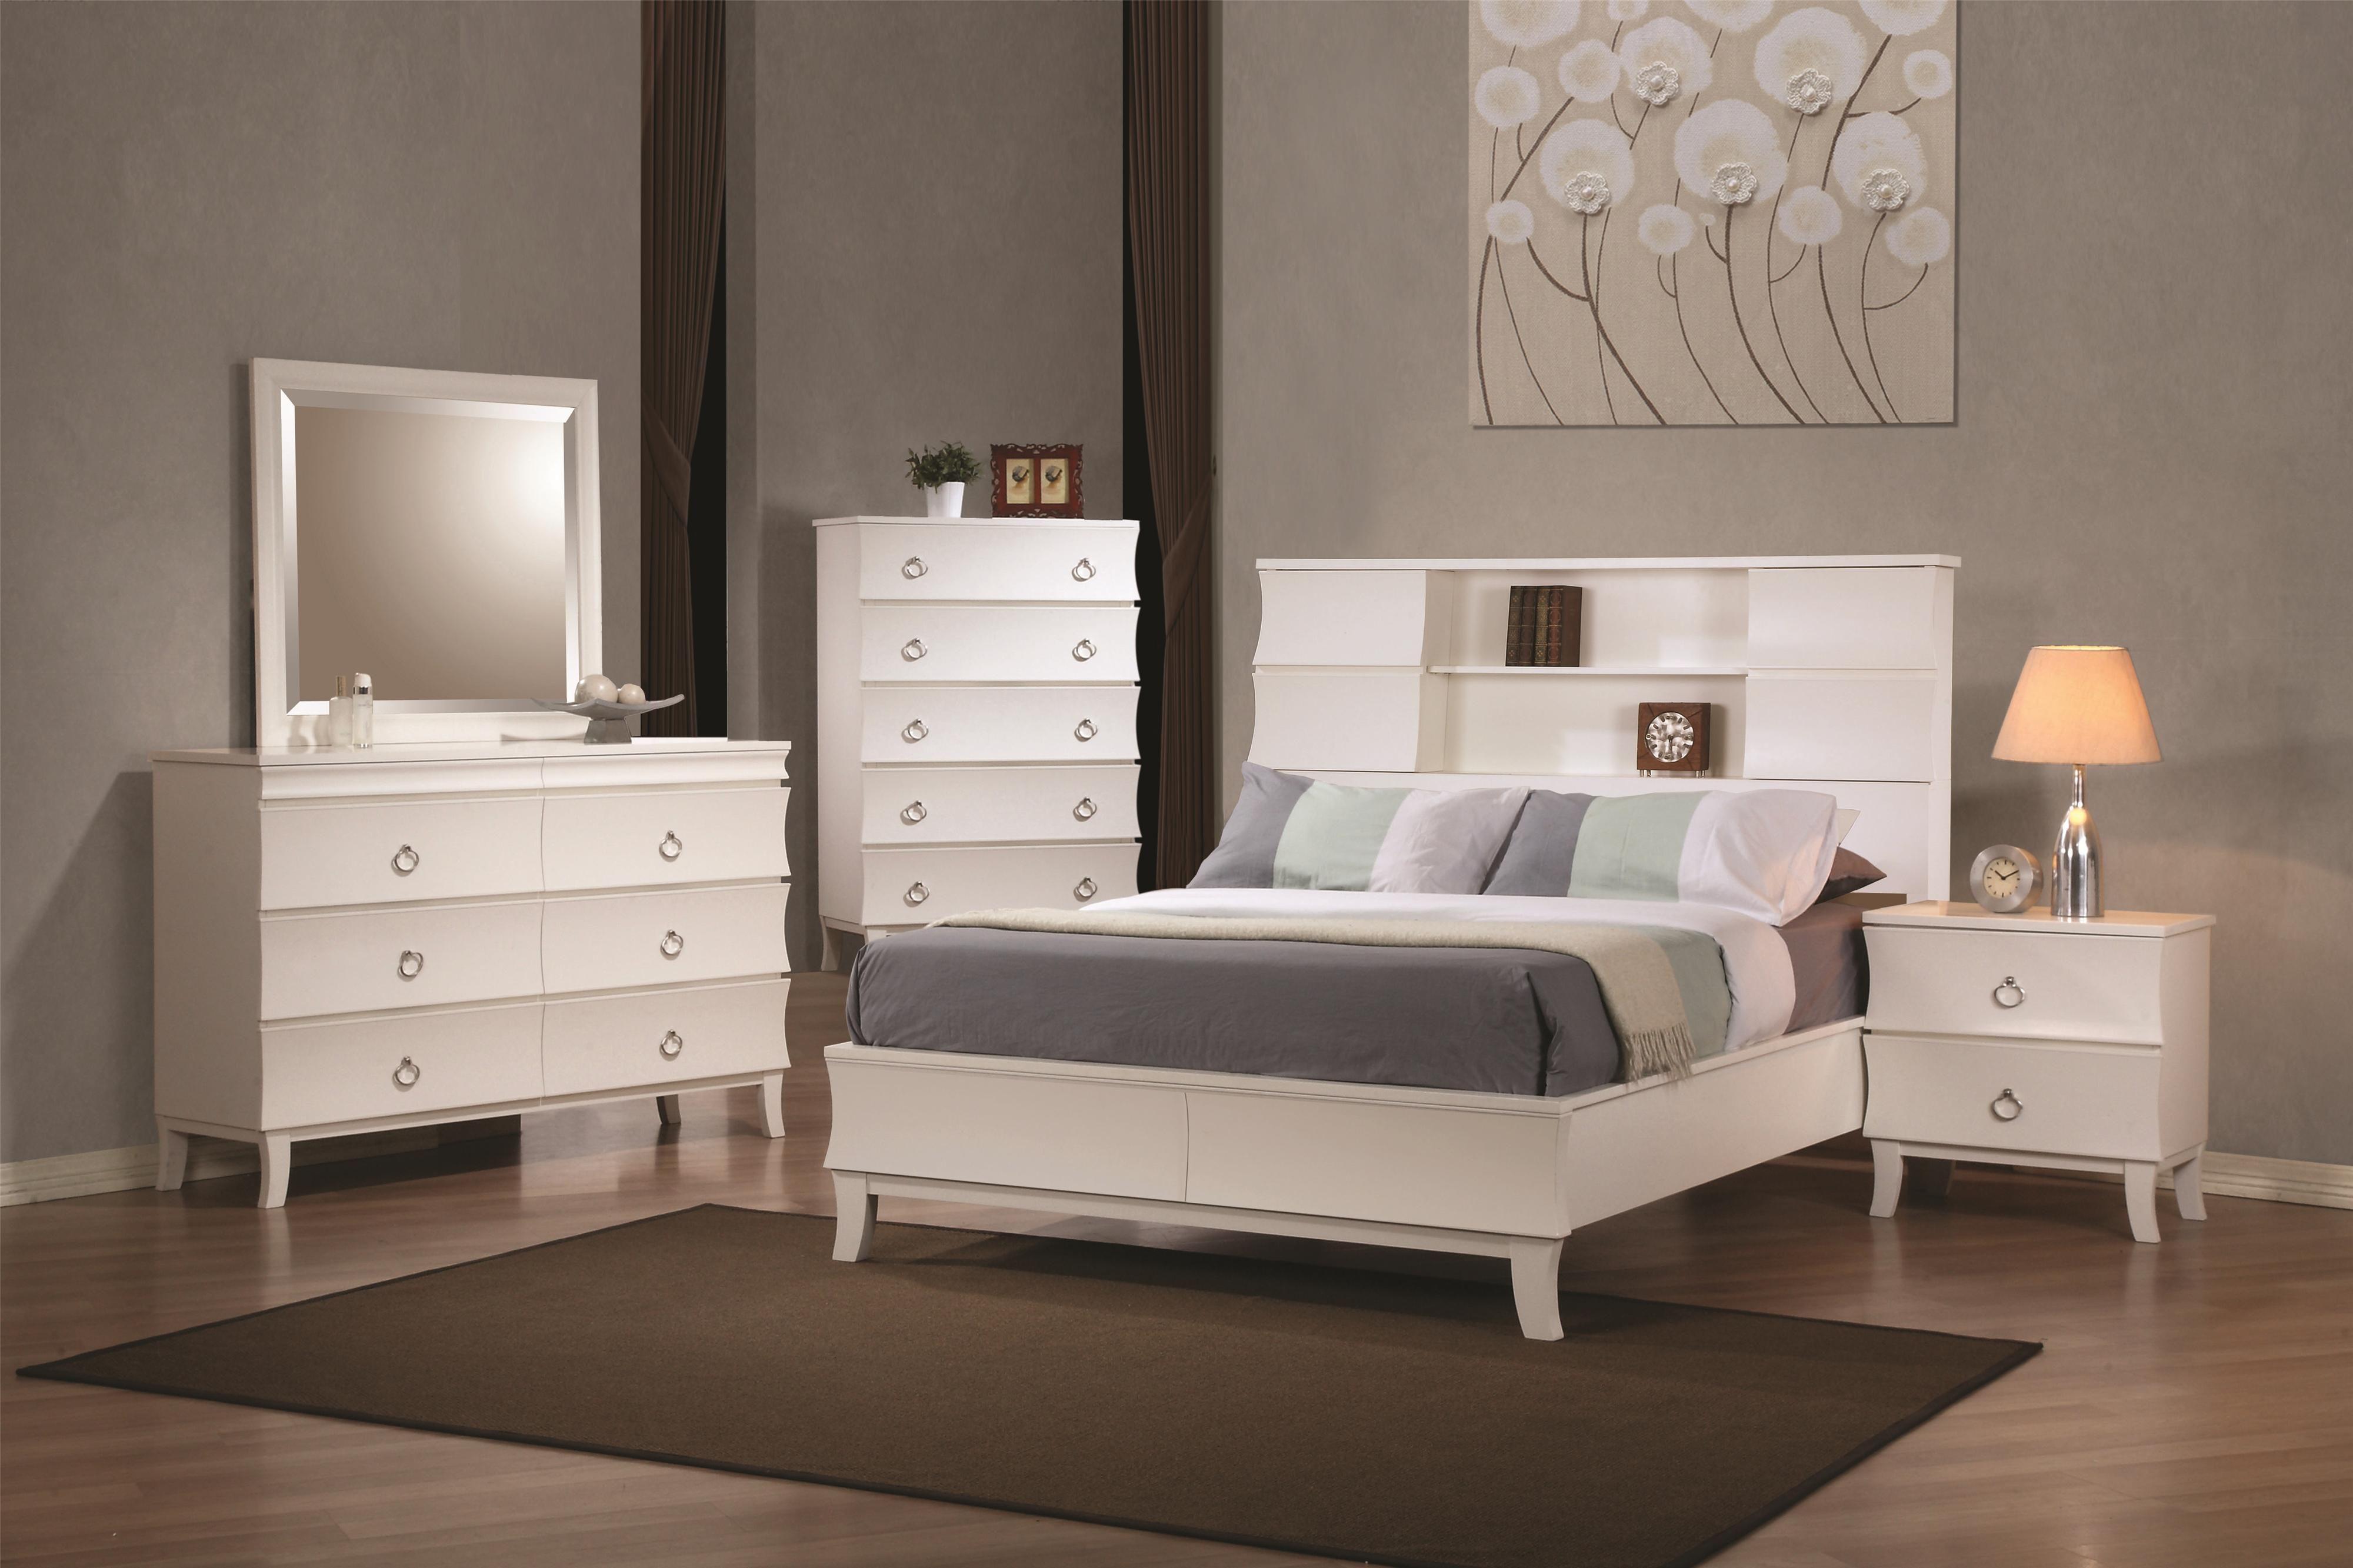 20 Best Bedroom Furniture Images On Pinterest Coaster And 3 4 Beds